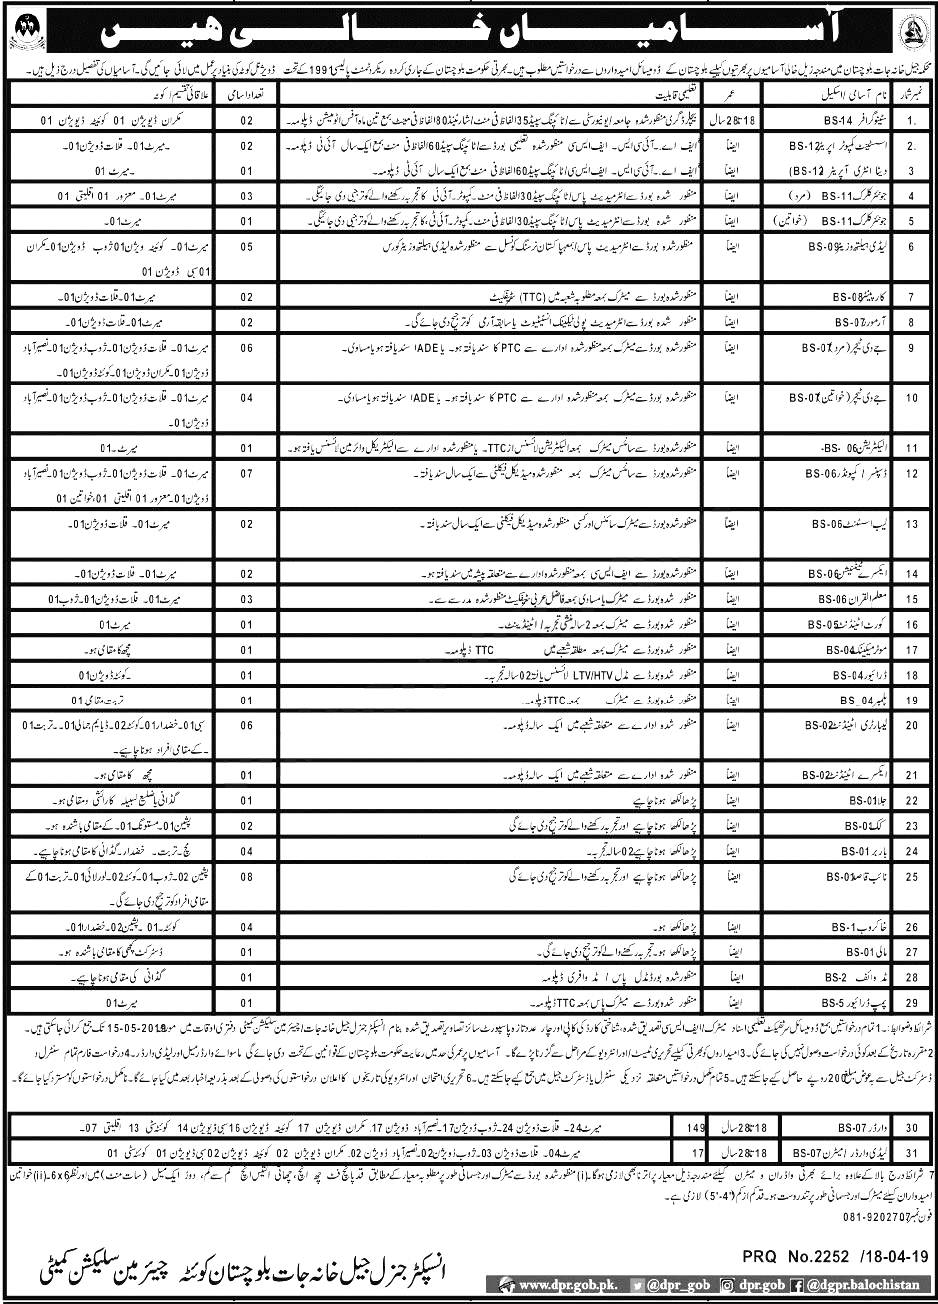 Balochistan Prisons Department Jobs 2019 Application Form Eligibility Criteria